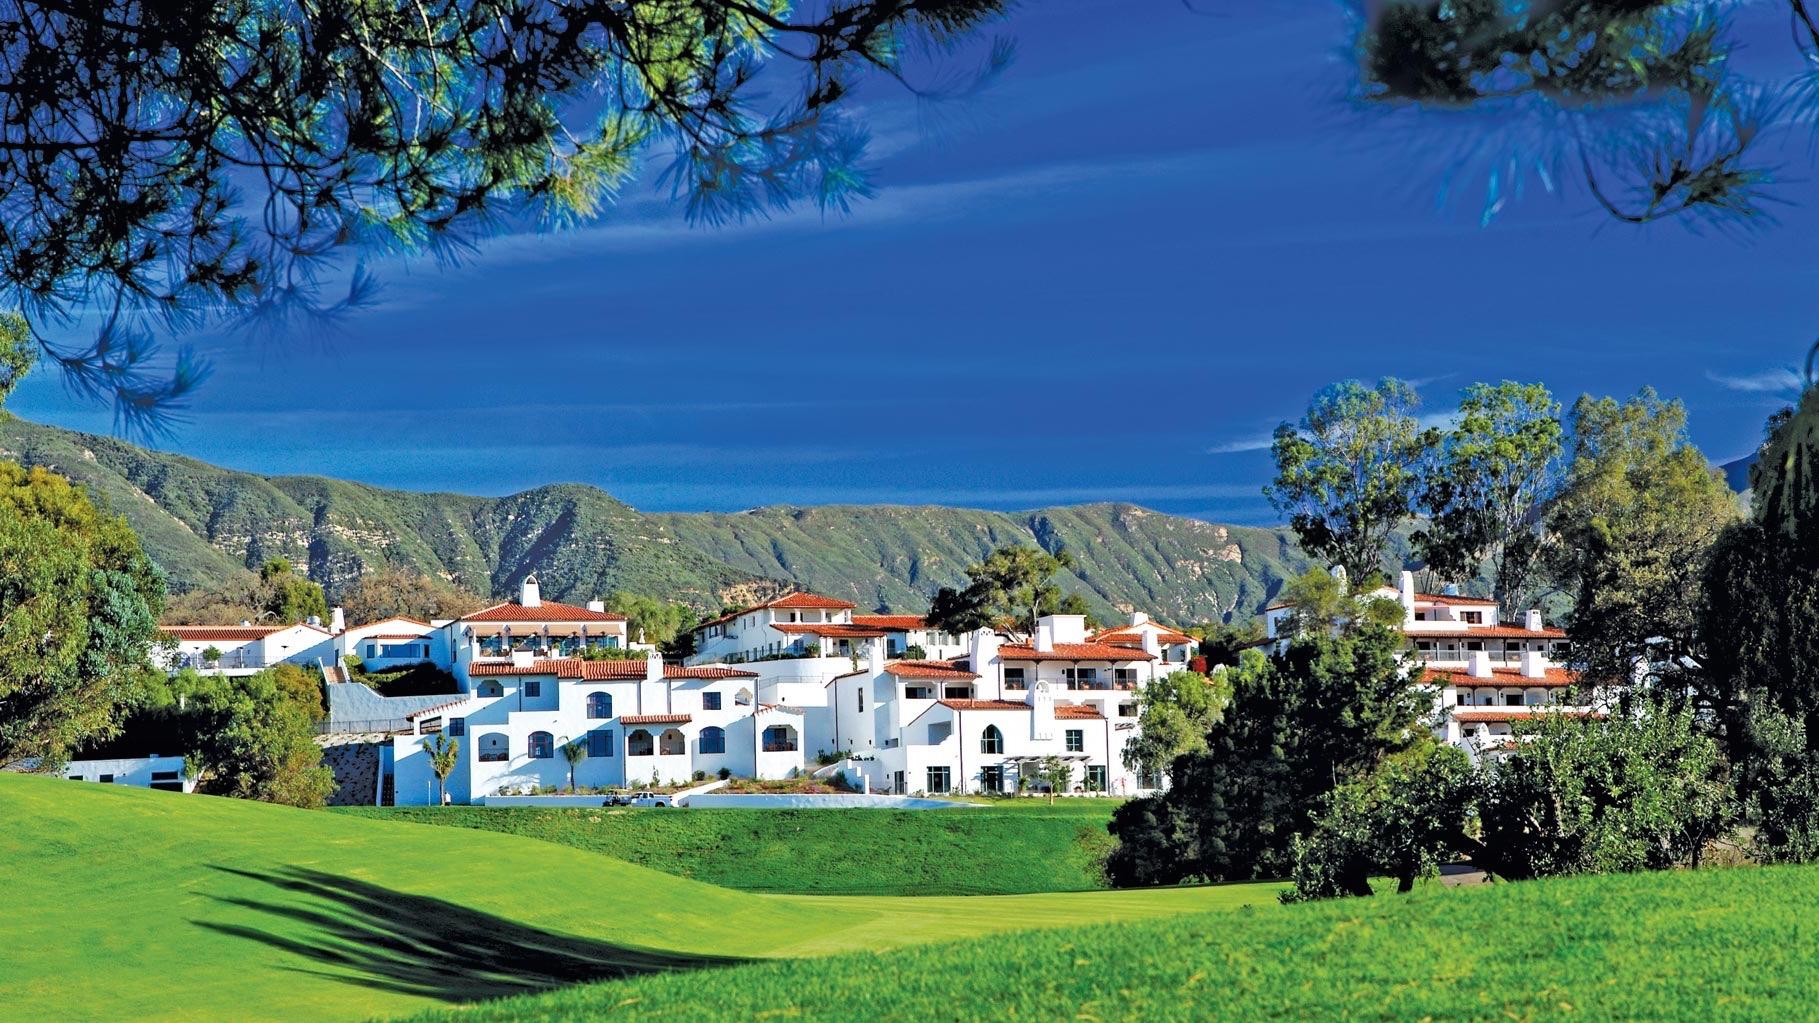 The Ojai Valley Inn